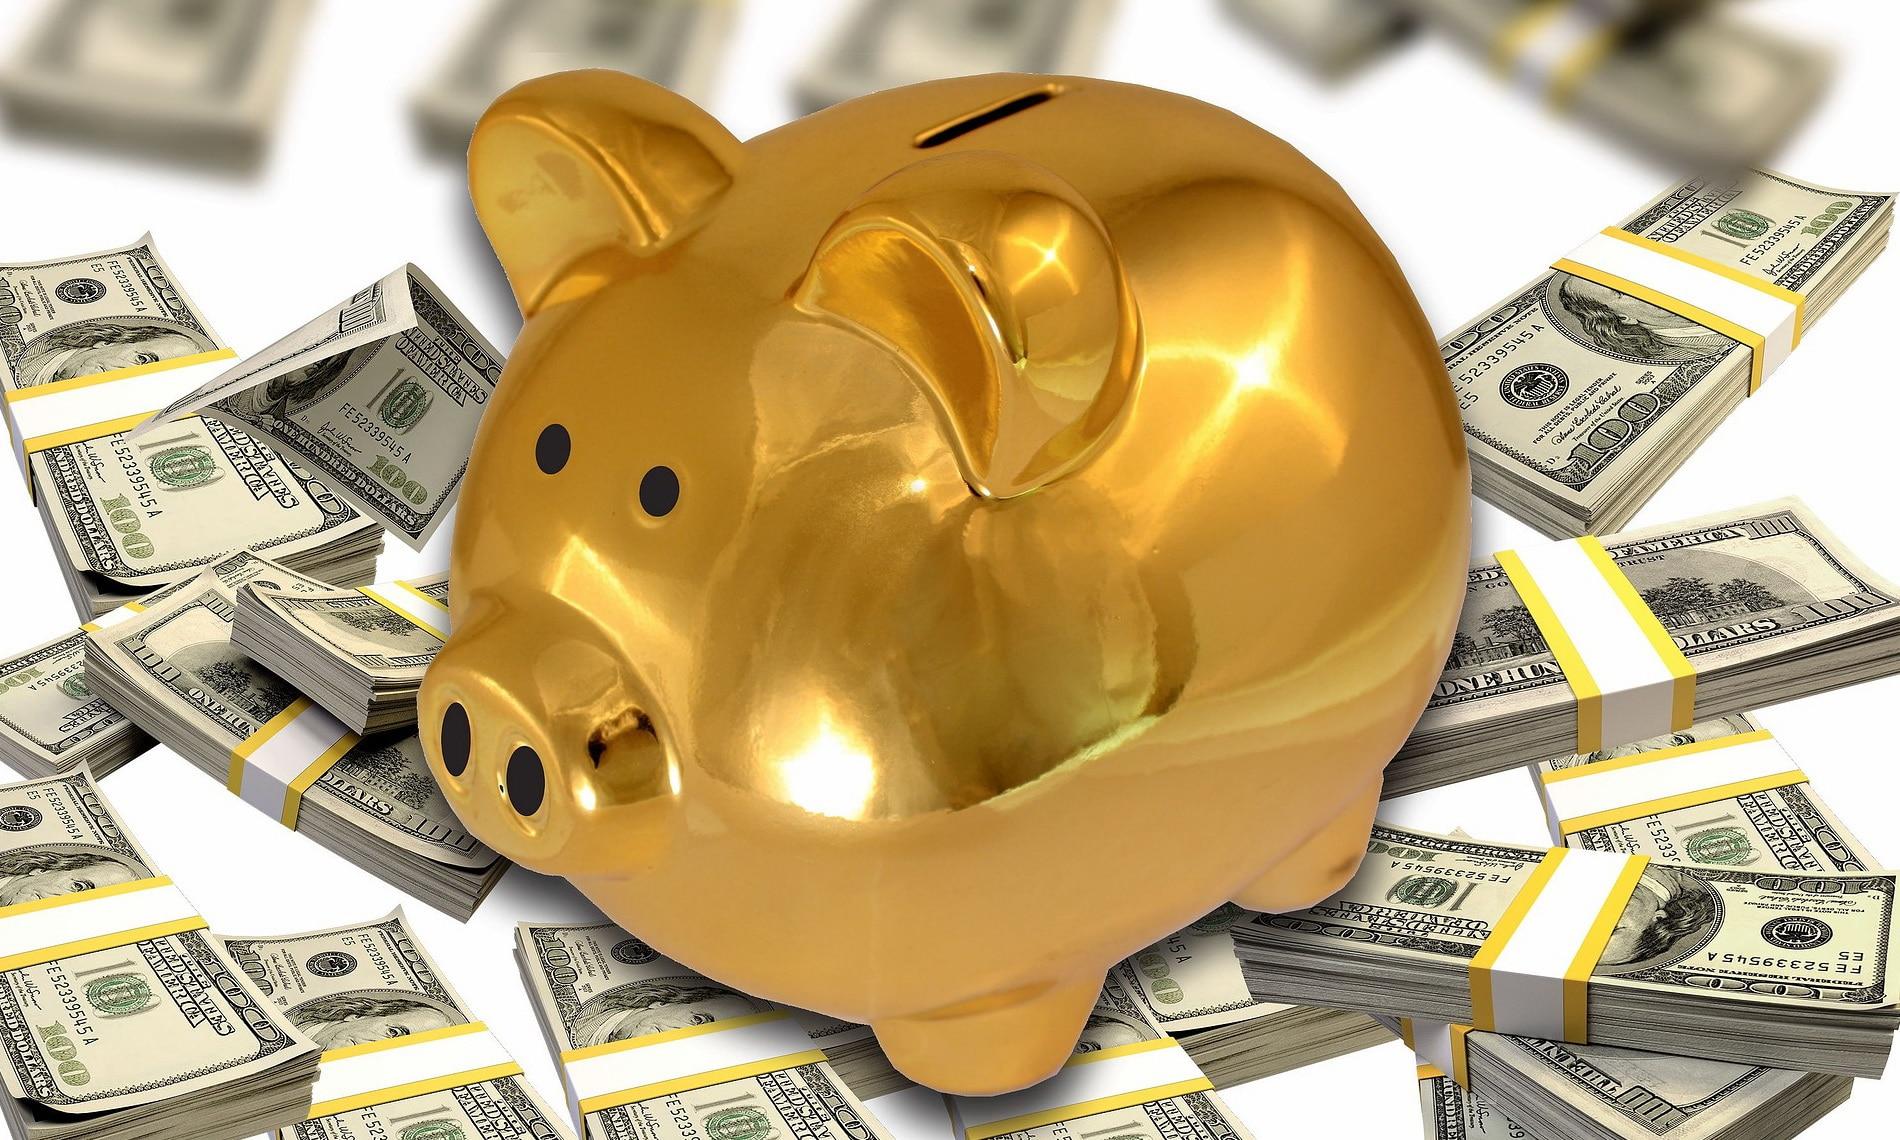 Das goldene Kapital